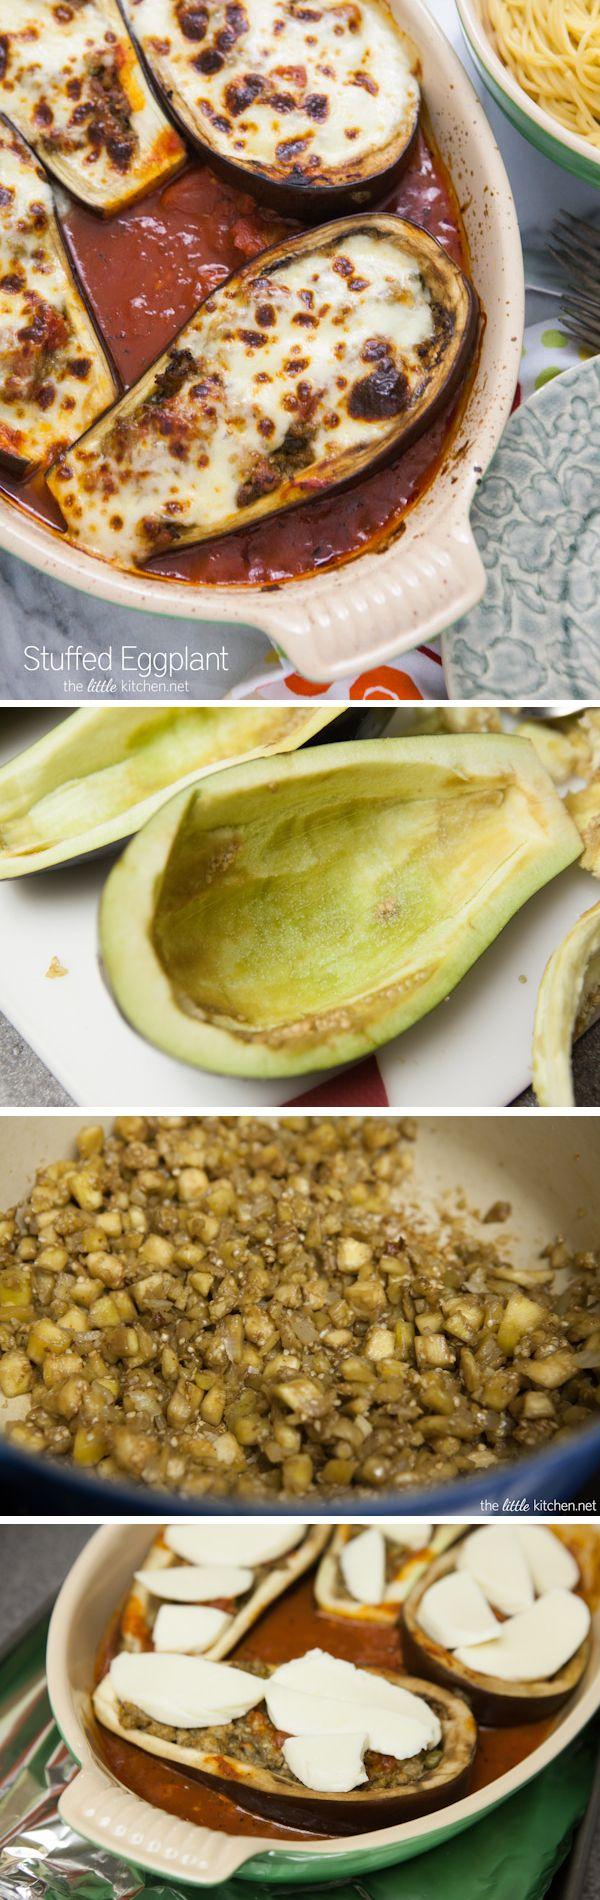 Stuffed Eggplant Recipe from thelittlekitchen.net